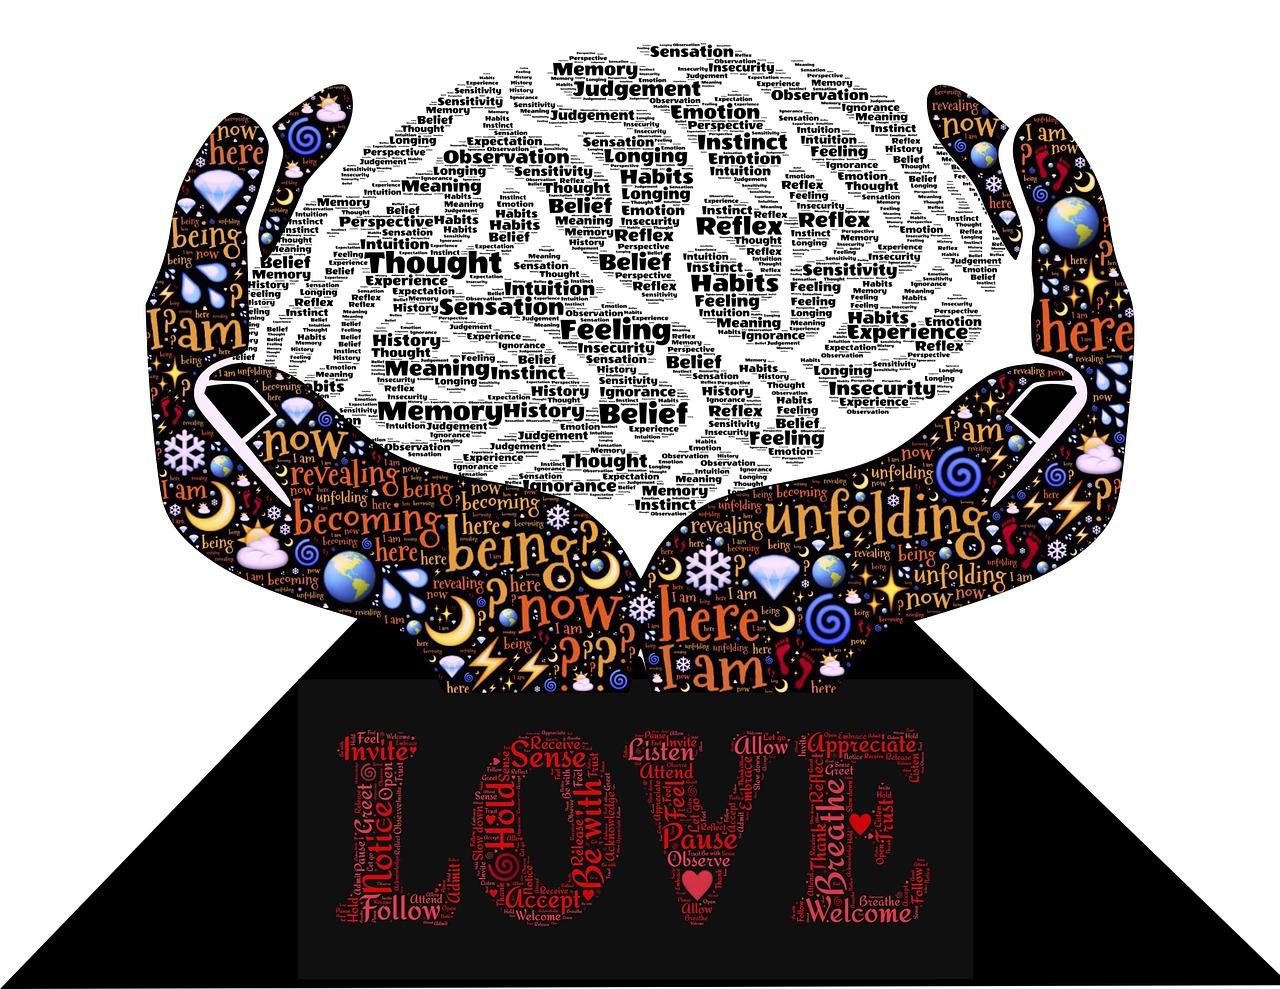 Loving-Kindness Meditation Techniques For Beginners